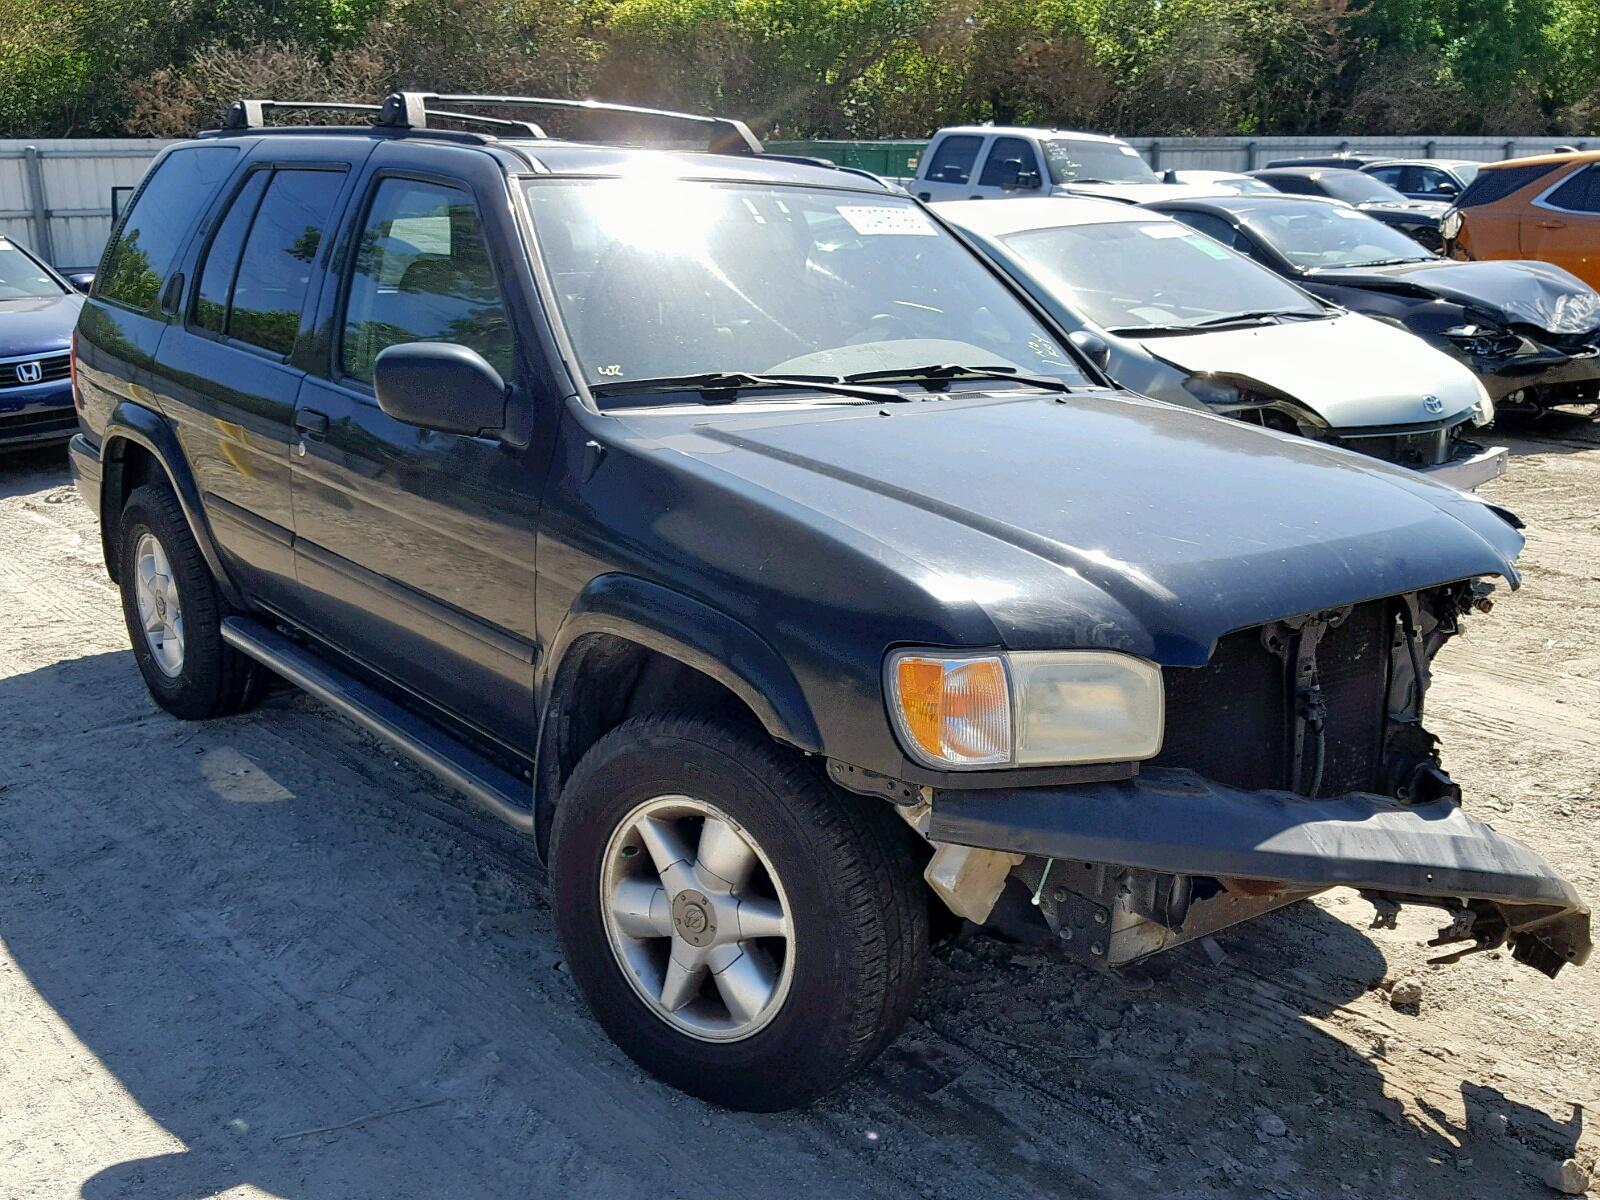 Salvage 2000 Nissan PATHFINDER for sale